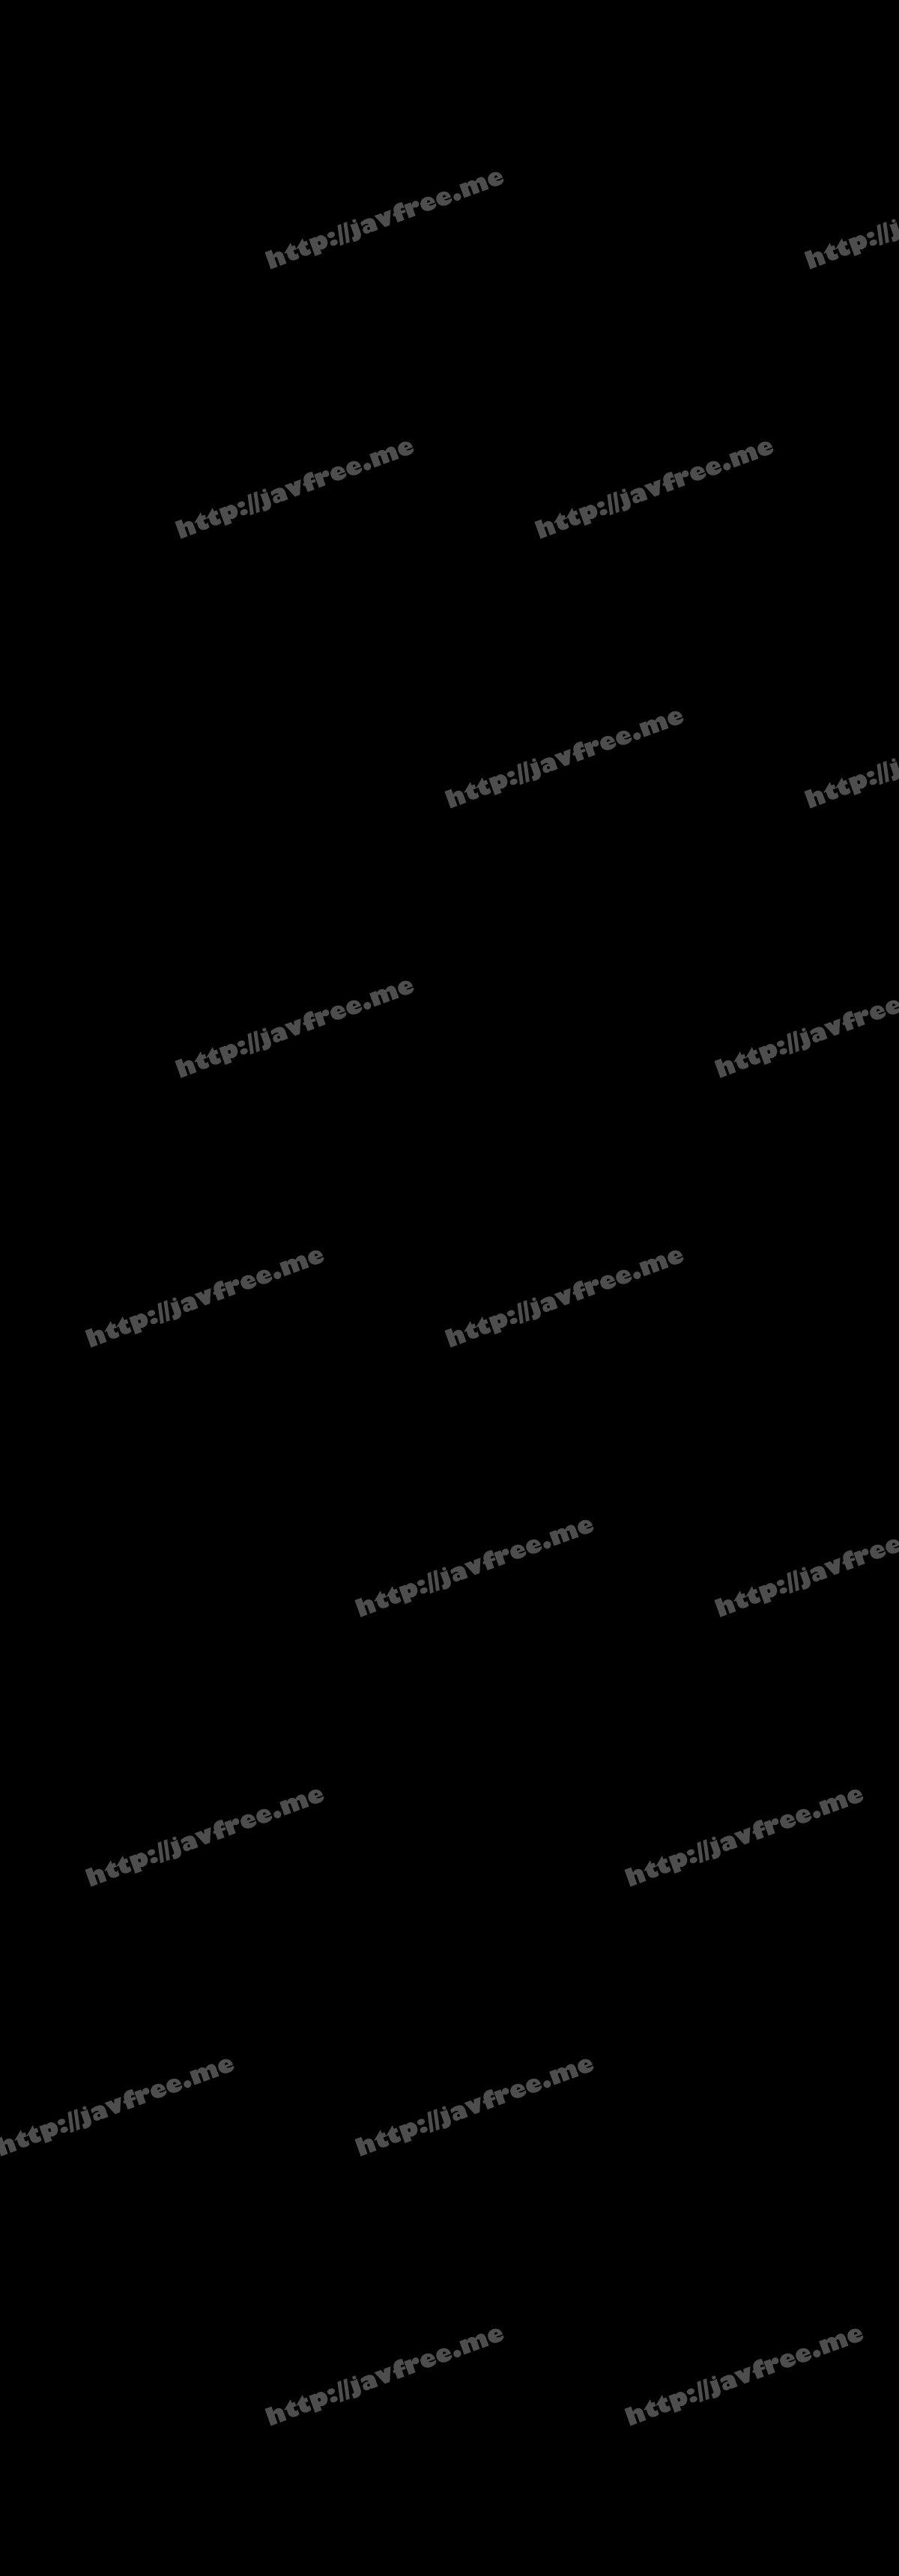 [HD][CHN-184] 新・素人娘、お貸しします。 90 仮名)一之瀬ひかり(大学生)21歳。 - image CHN-184-1080p on https://javfree.me